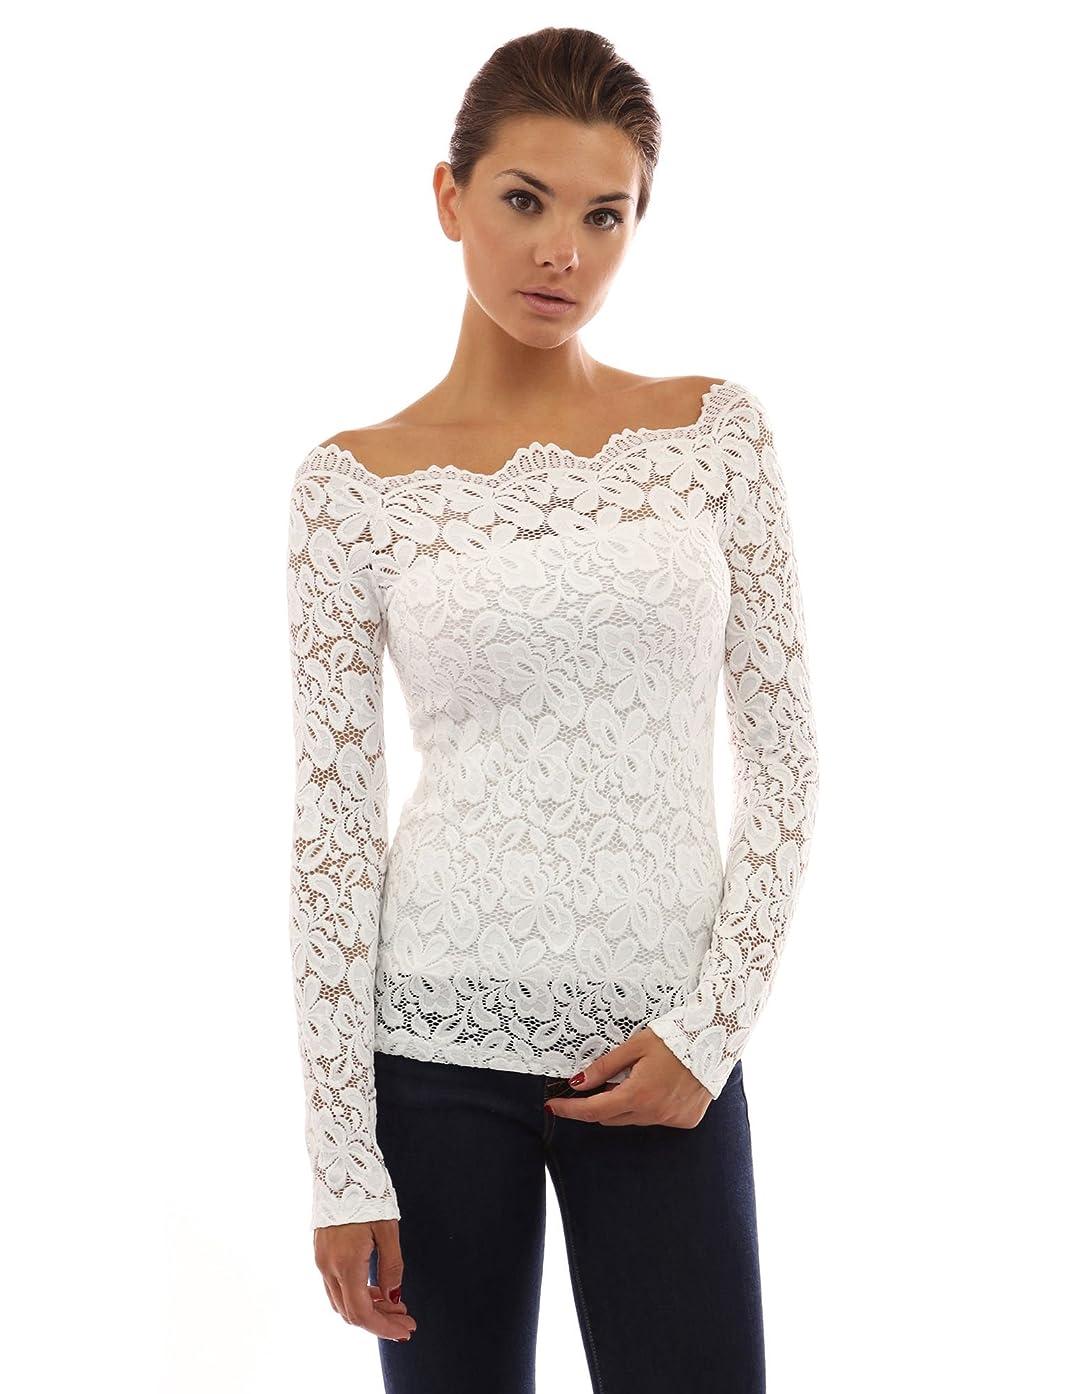 PattyBoutik Women Floral Lace Off Shoulder Top